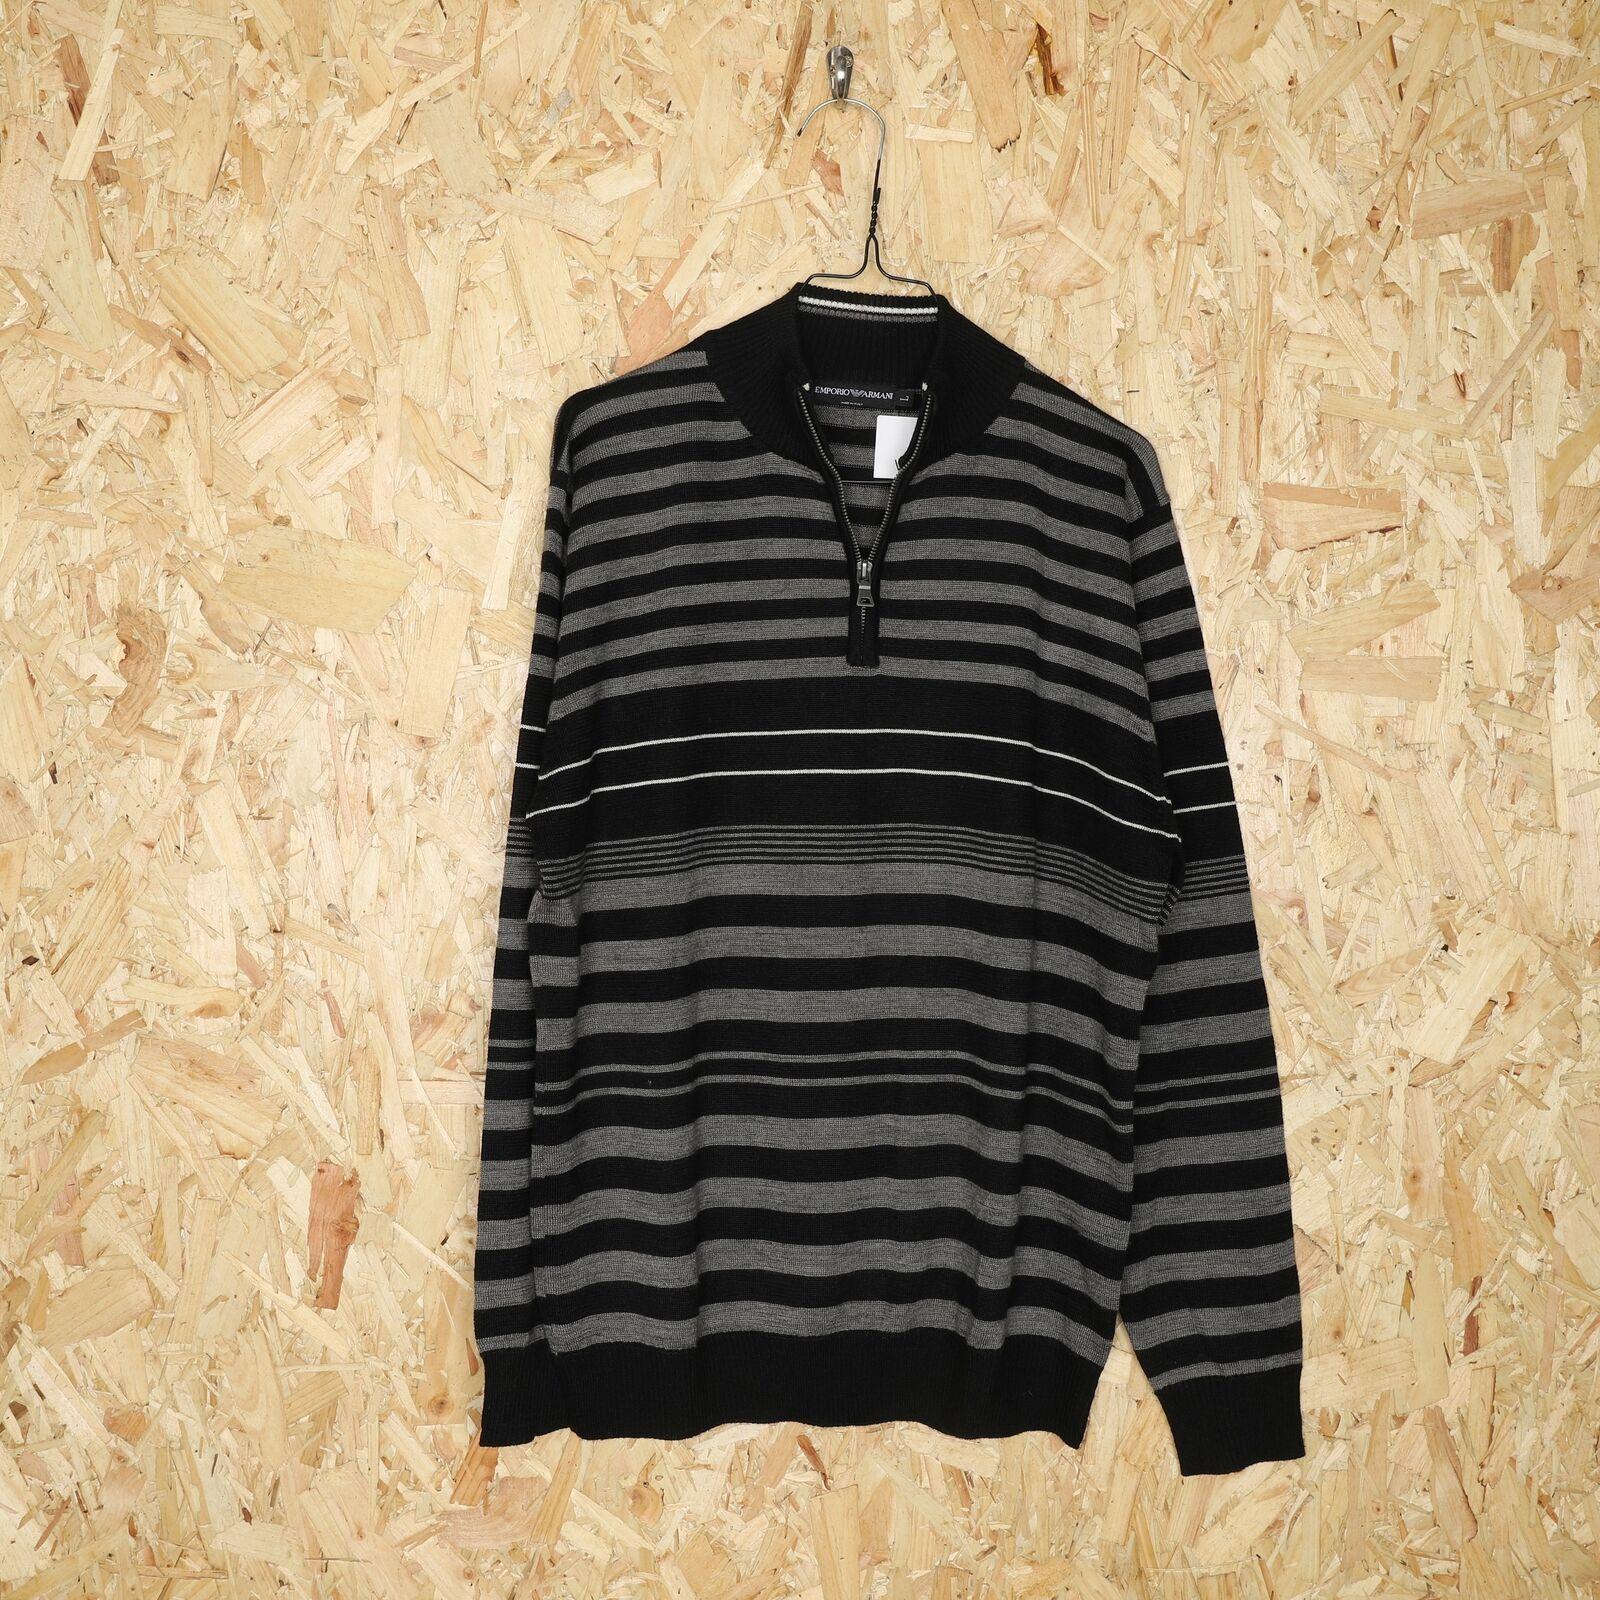 EMPORIO ARMANI 1/4 Zip Knitted Sweatshirt Black   Large L